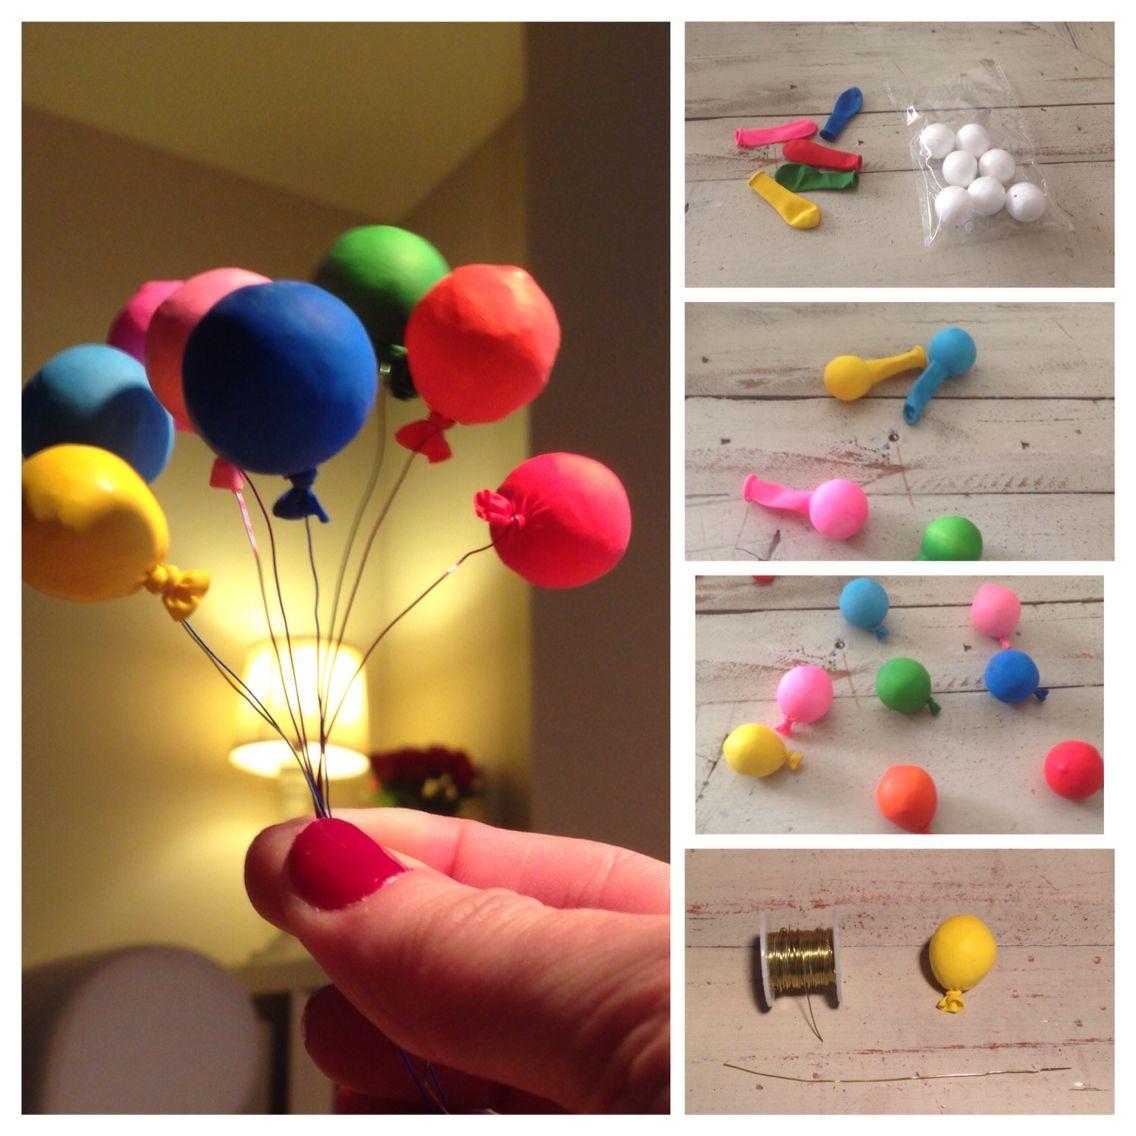 Dollhouse Miniatures Diy Tutorials: 1000+ Images About Dollhouse Toys On Pinterest